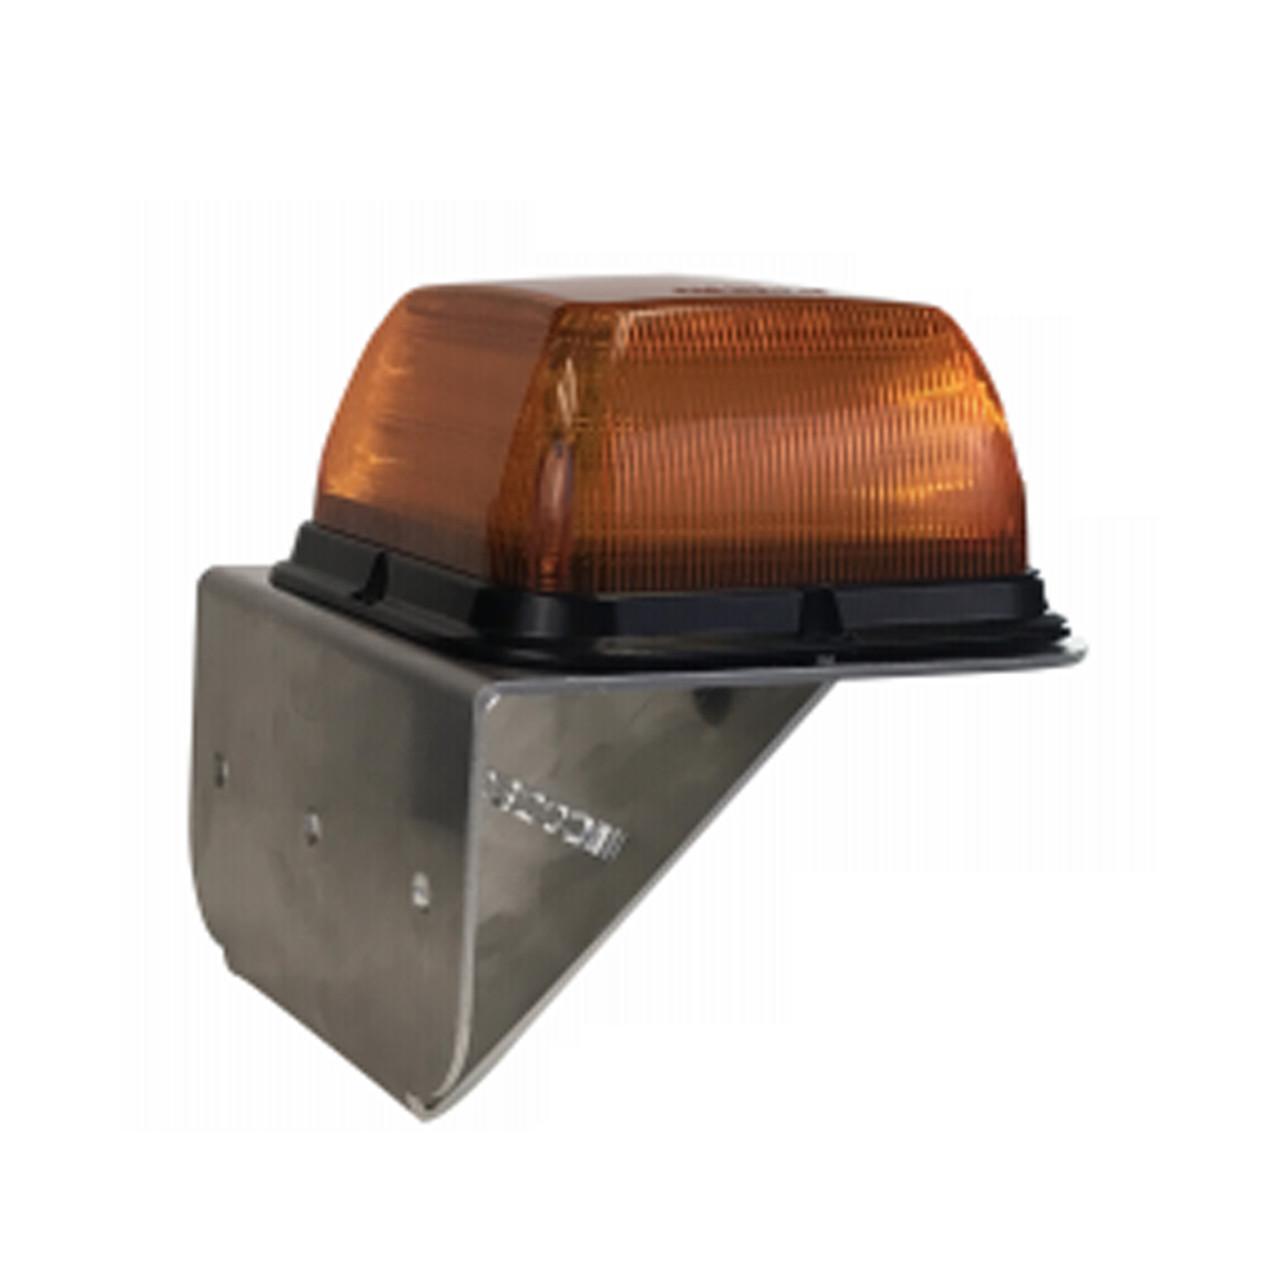 Qiilu Outboard Boat Engine Ignition Emergency Safety Kill Stop Switch Lanyard for Suzuki Yamaha Motors